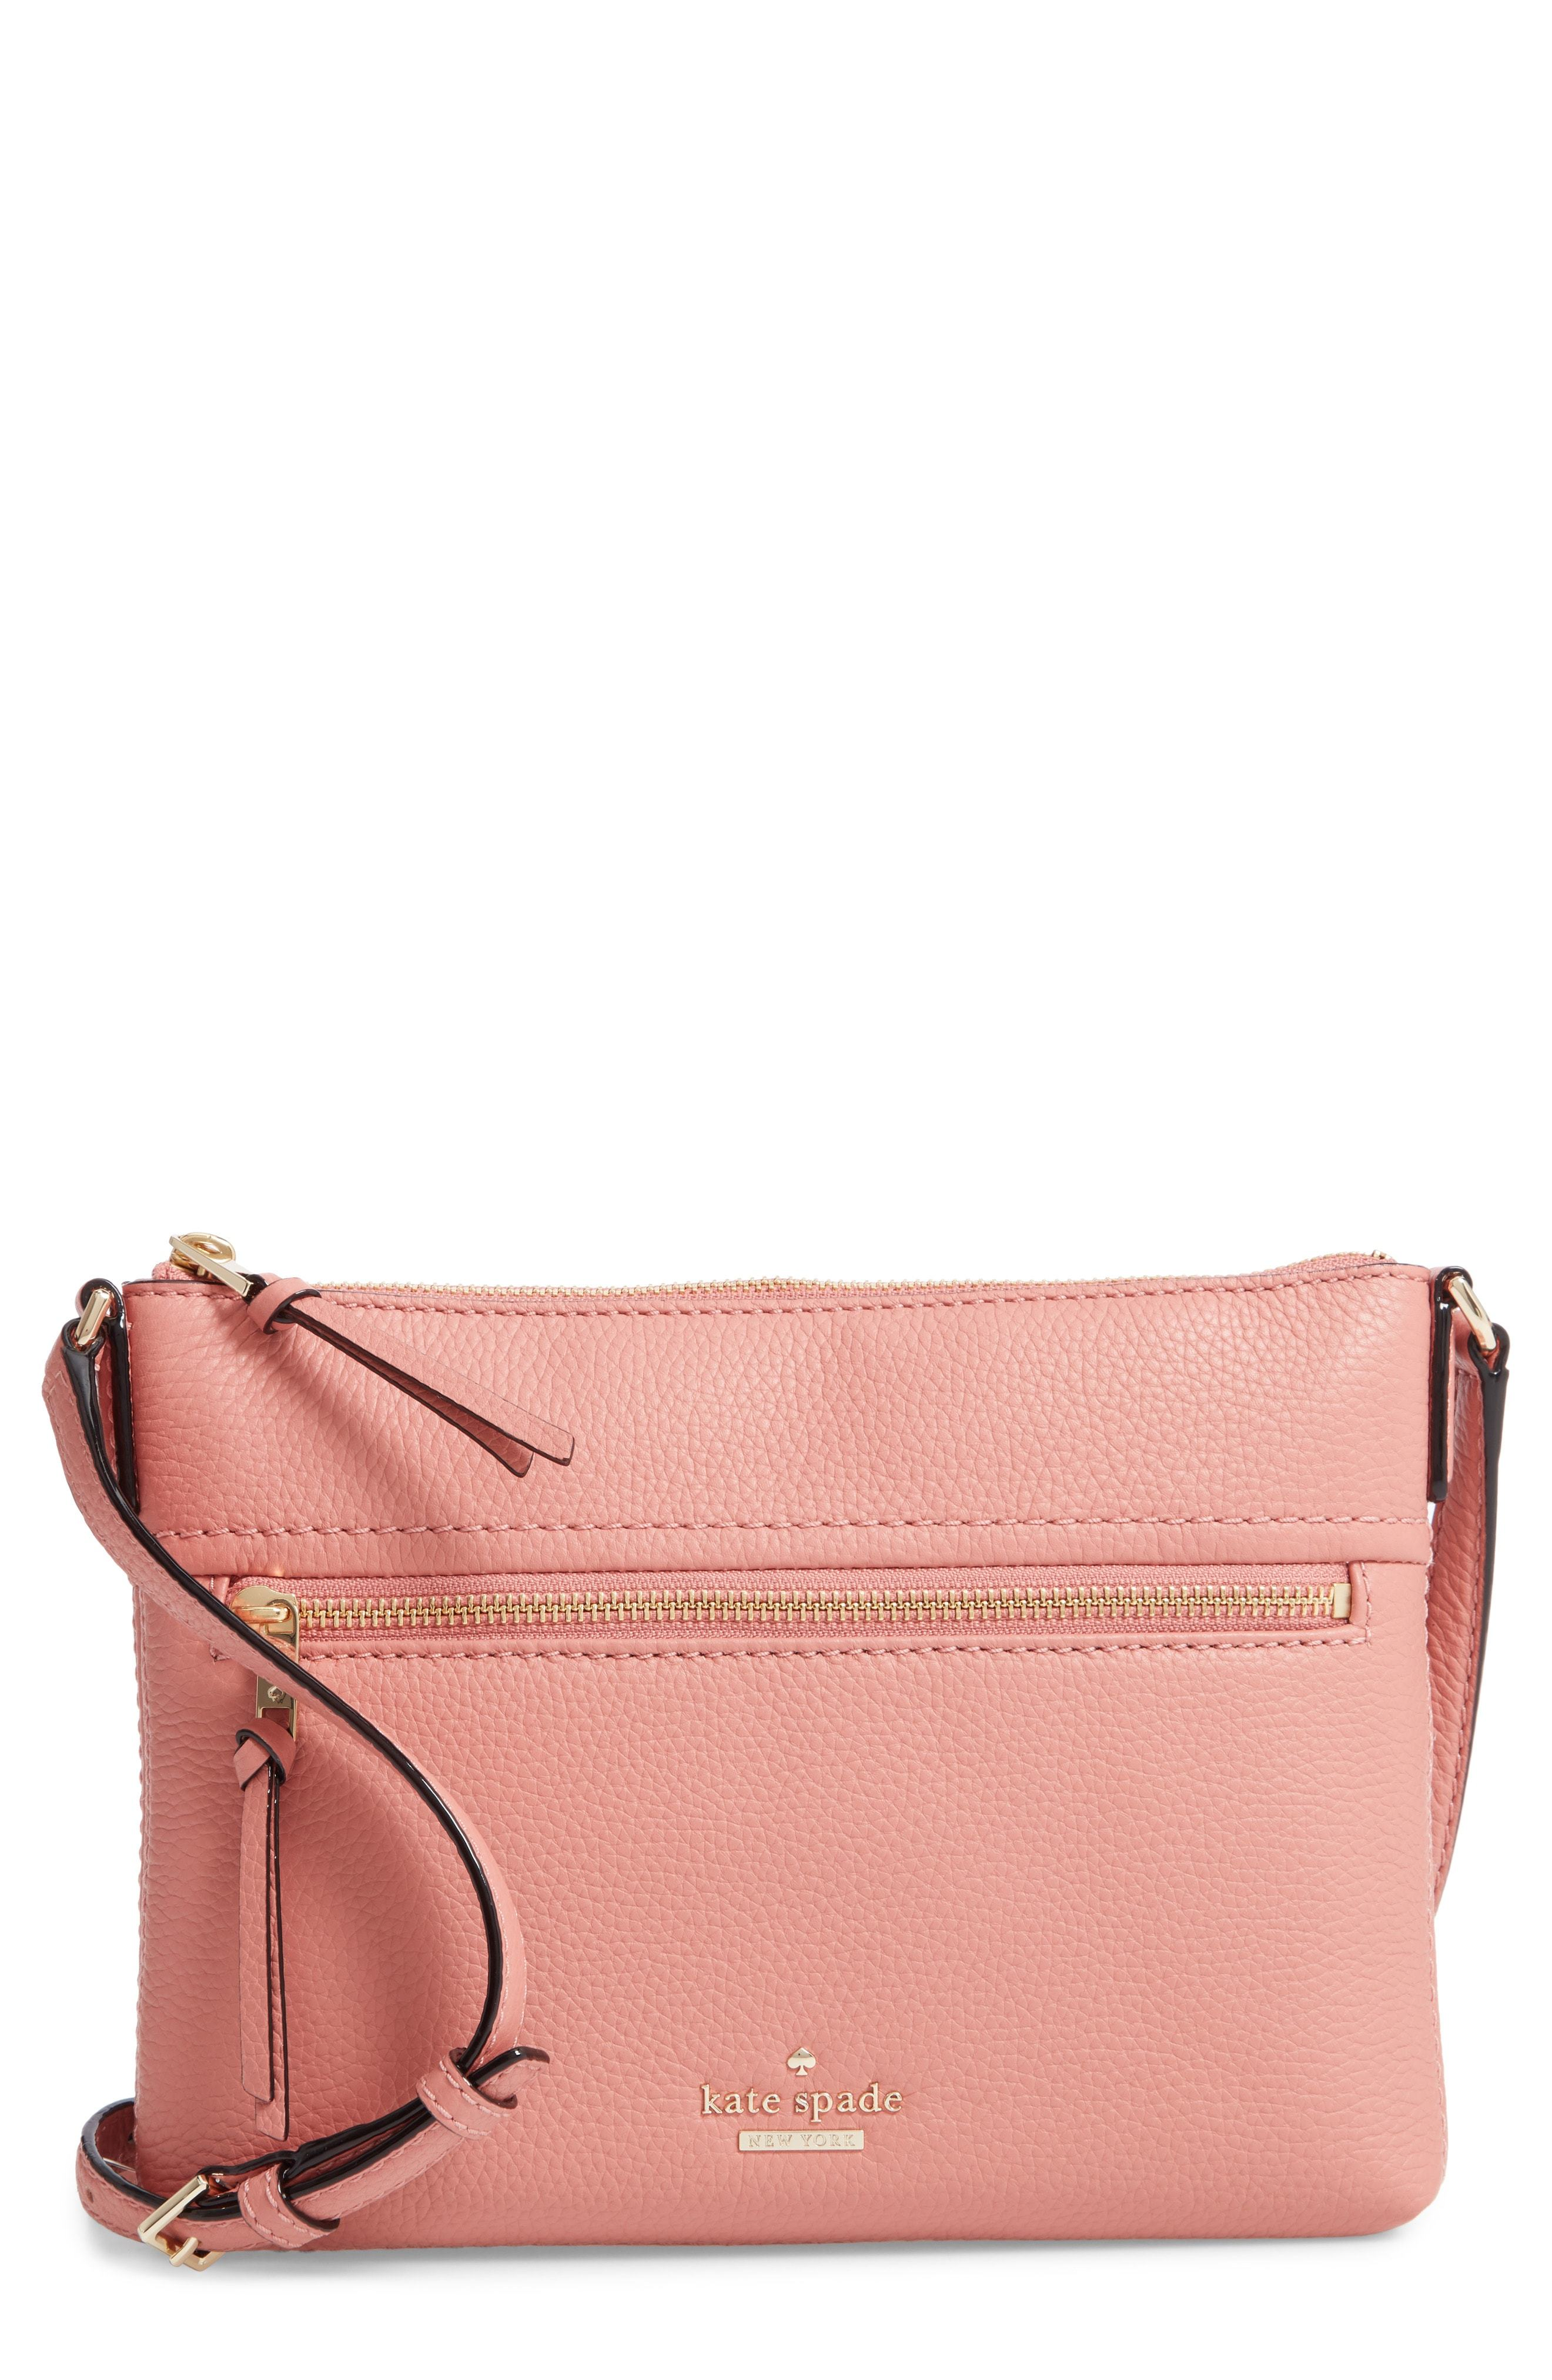 762589b20 ... Nordstrom › kate spade new york › Pink Leather Crossbody Bags kate spade  new york Jackson Street Gabriele Leather Crossbody Bag